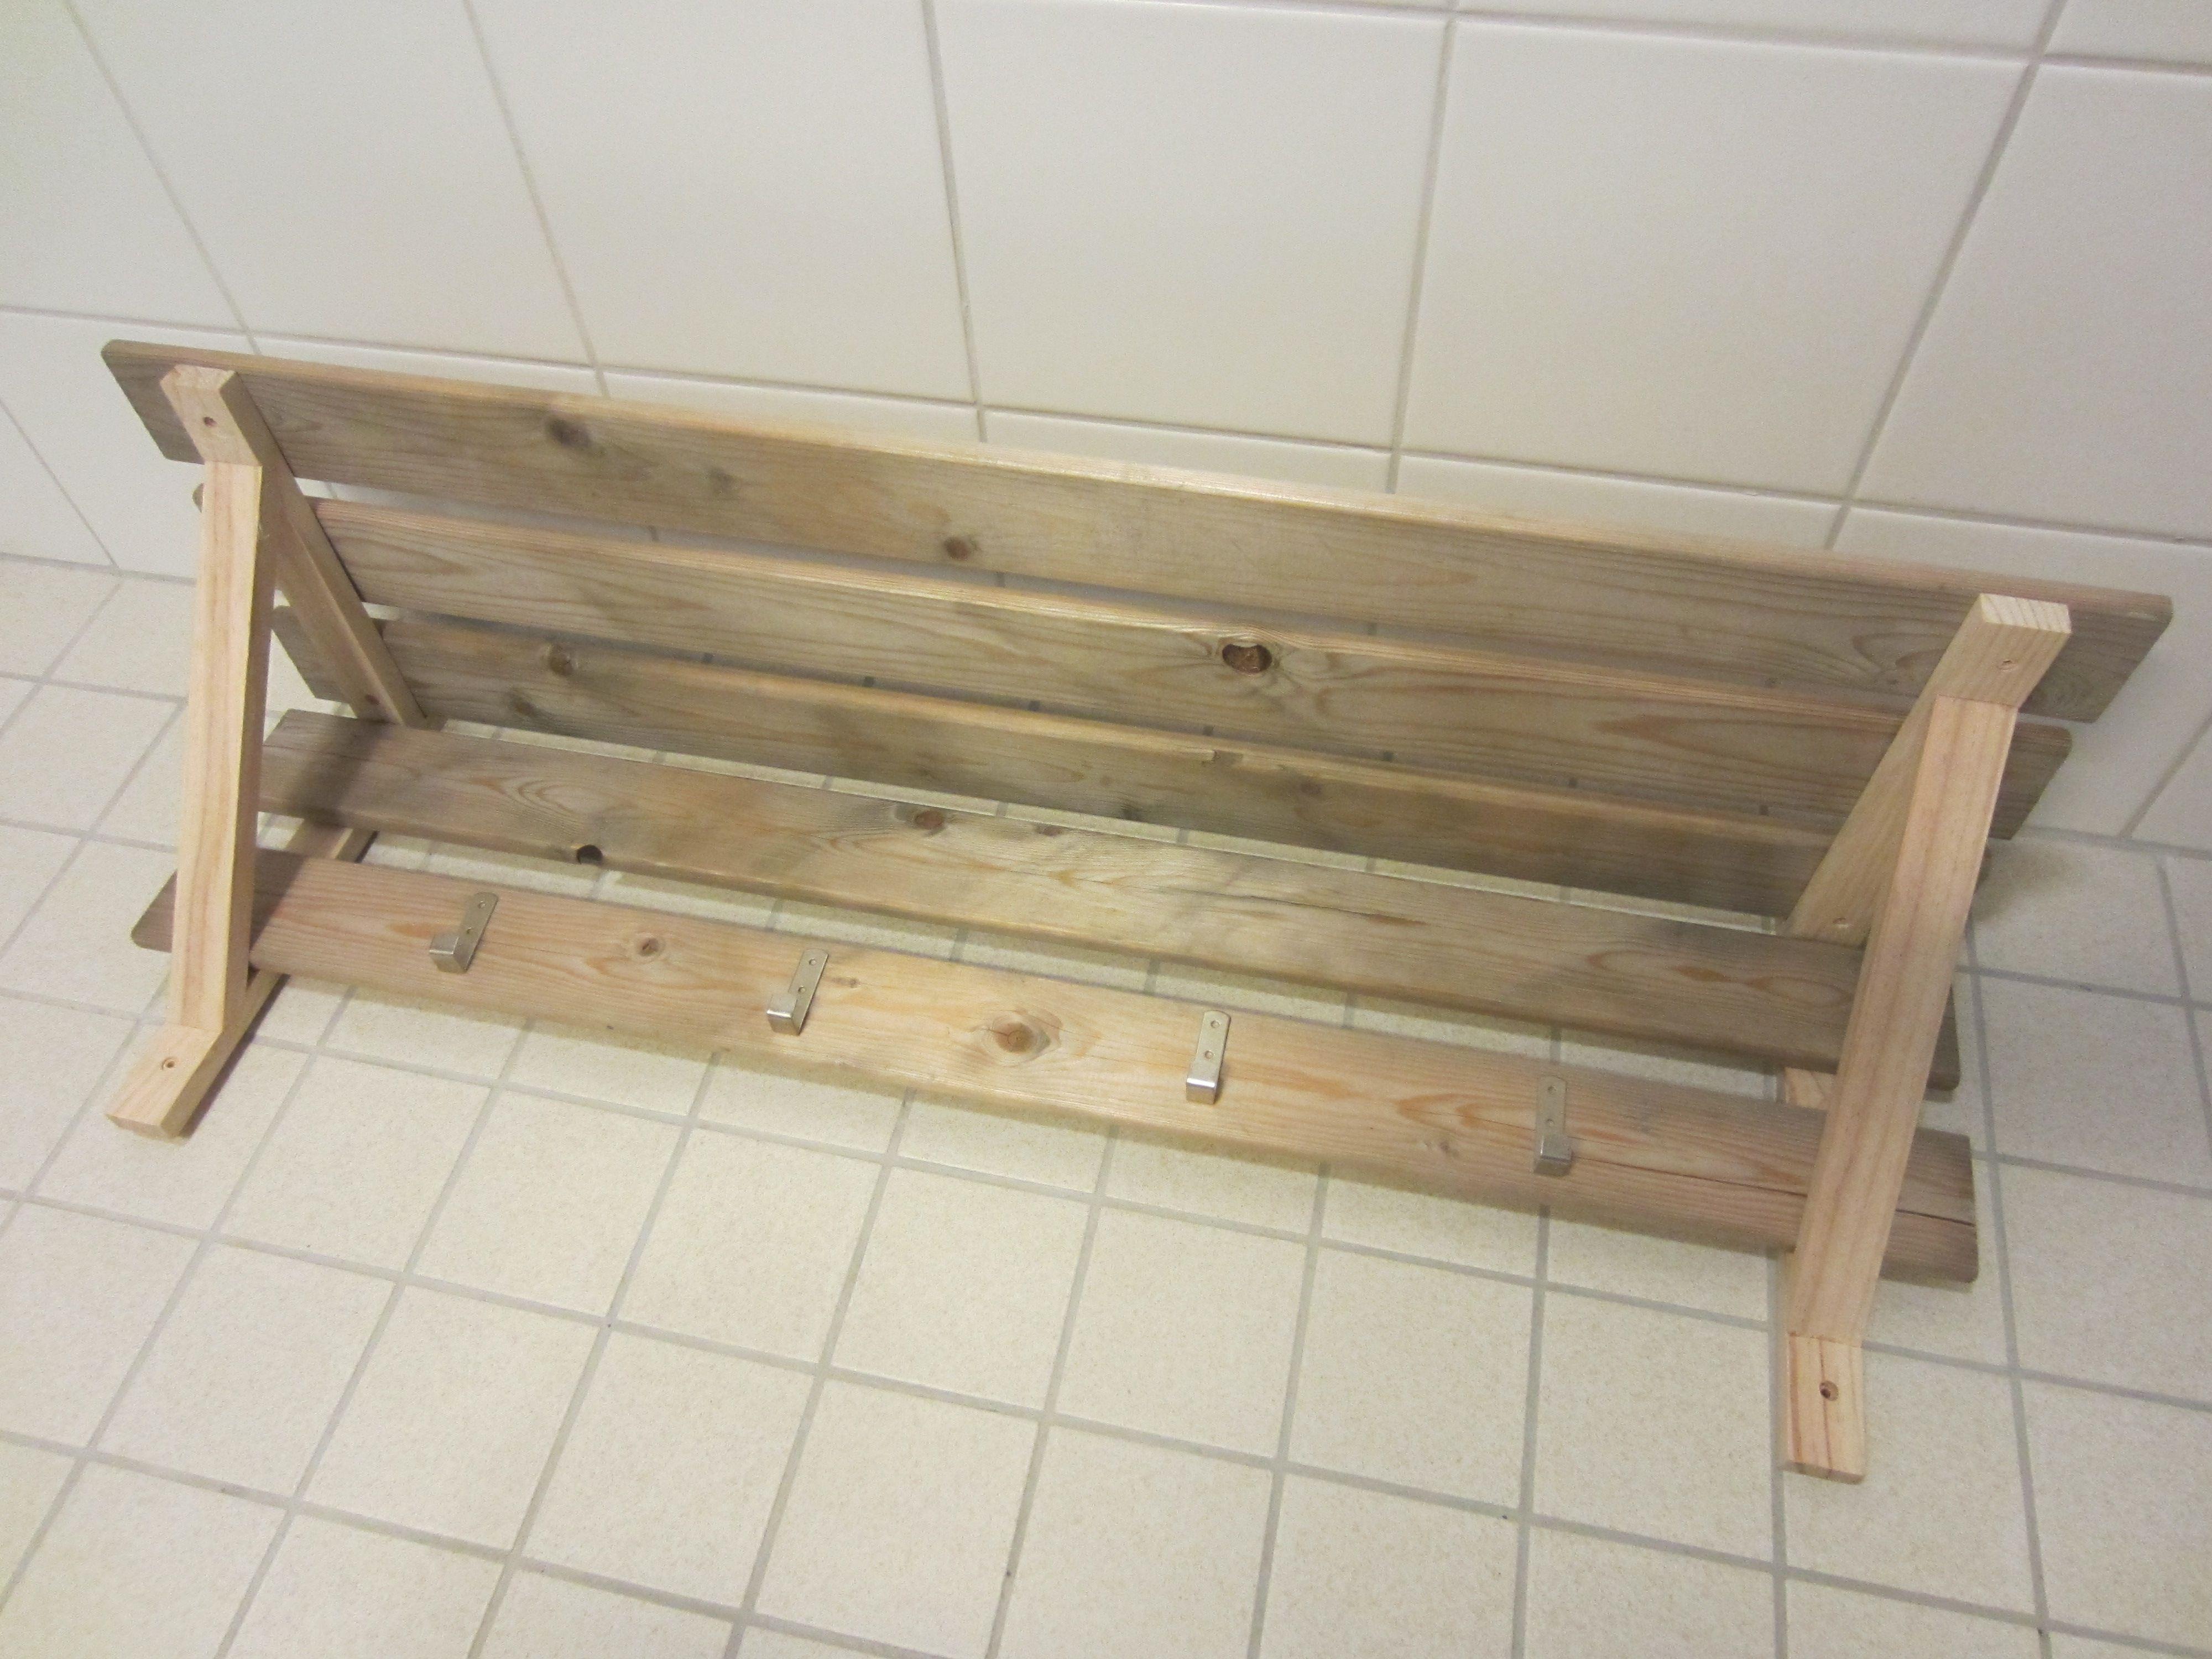 Tee-se-itse-naisen sisustusblogi: Coat Rack Made Out Of Reclaimed Wood